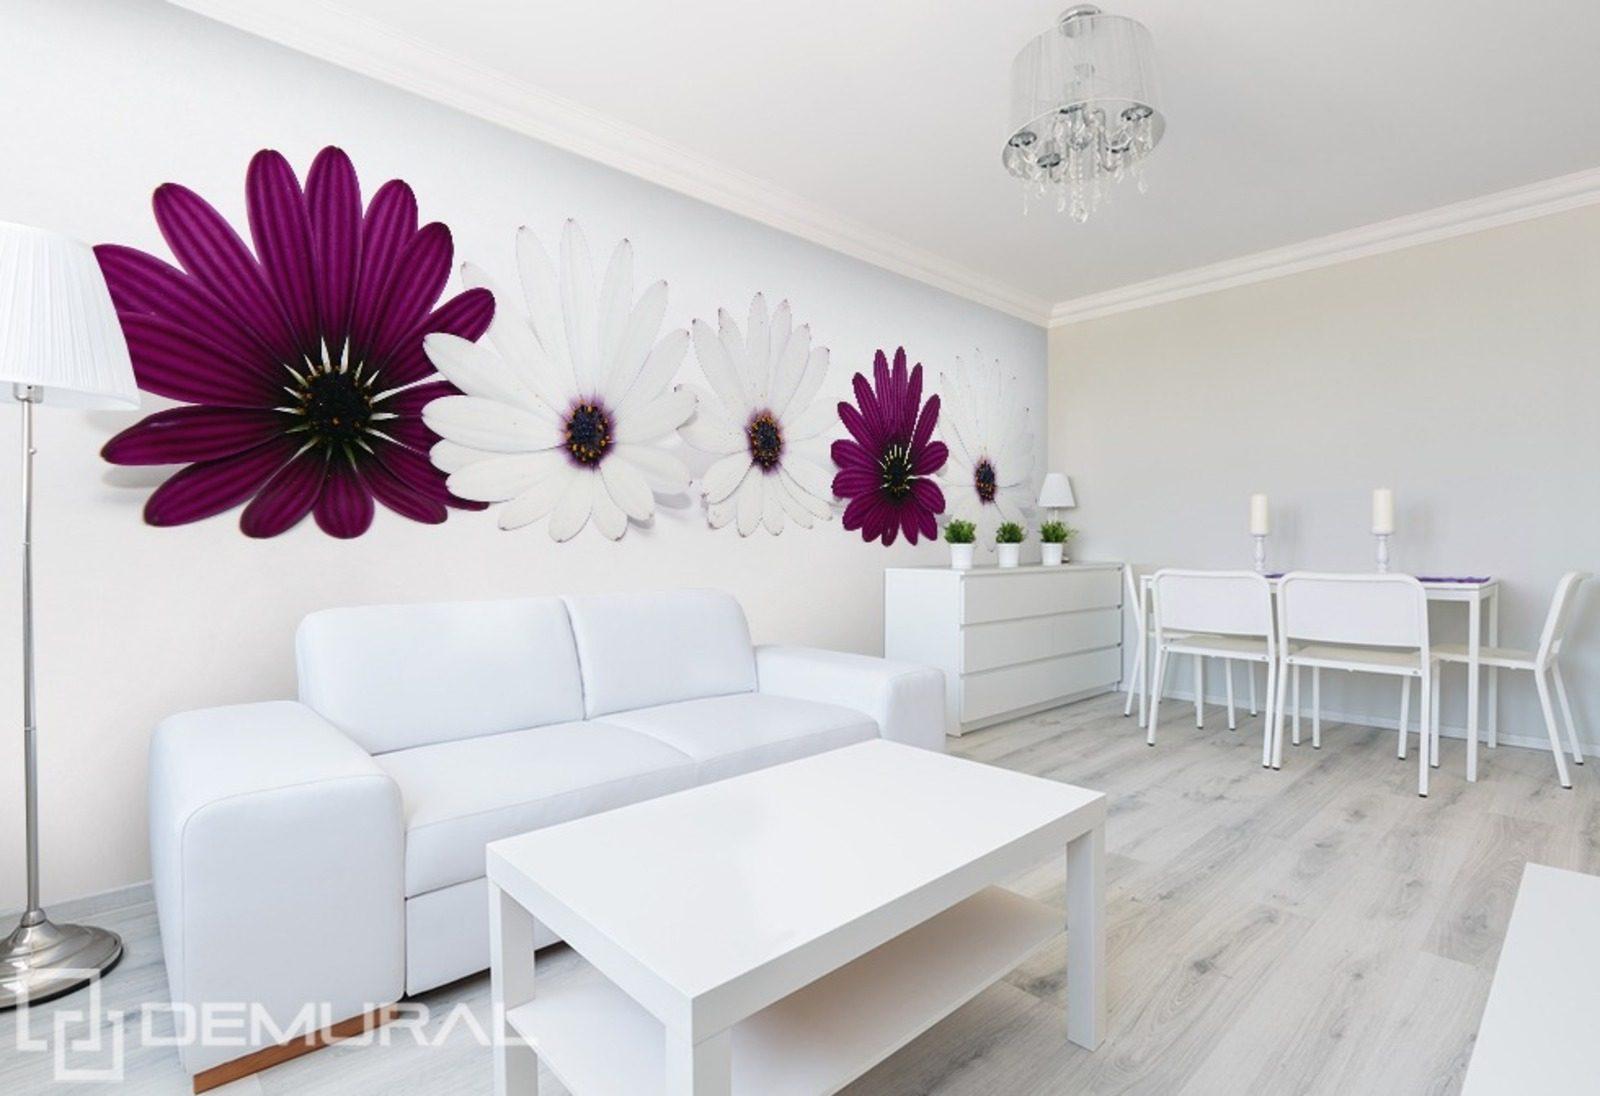 fototapete vlies astern tapeten fototapeten blumen fdb27 ebay. Black Bedroom Furniture Sets. Home Design Ideas